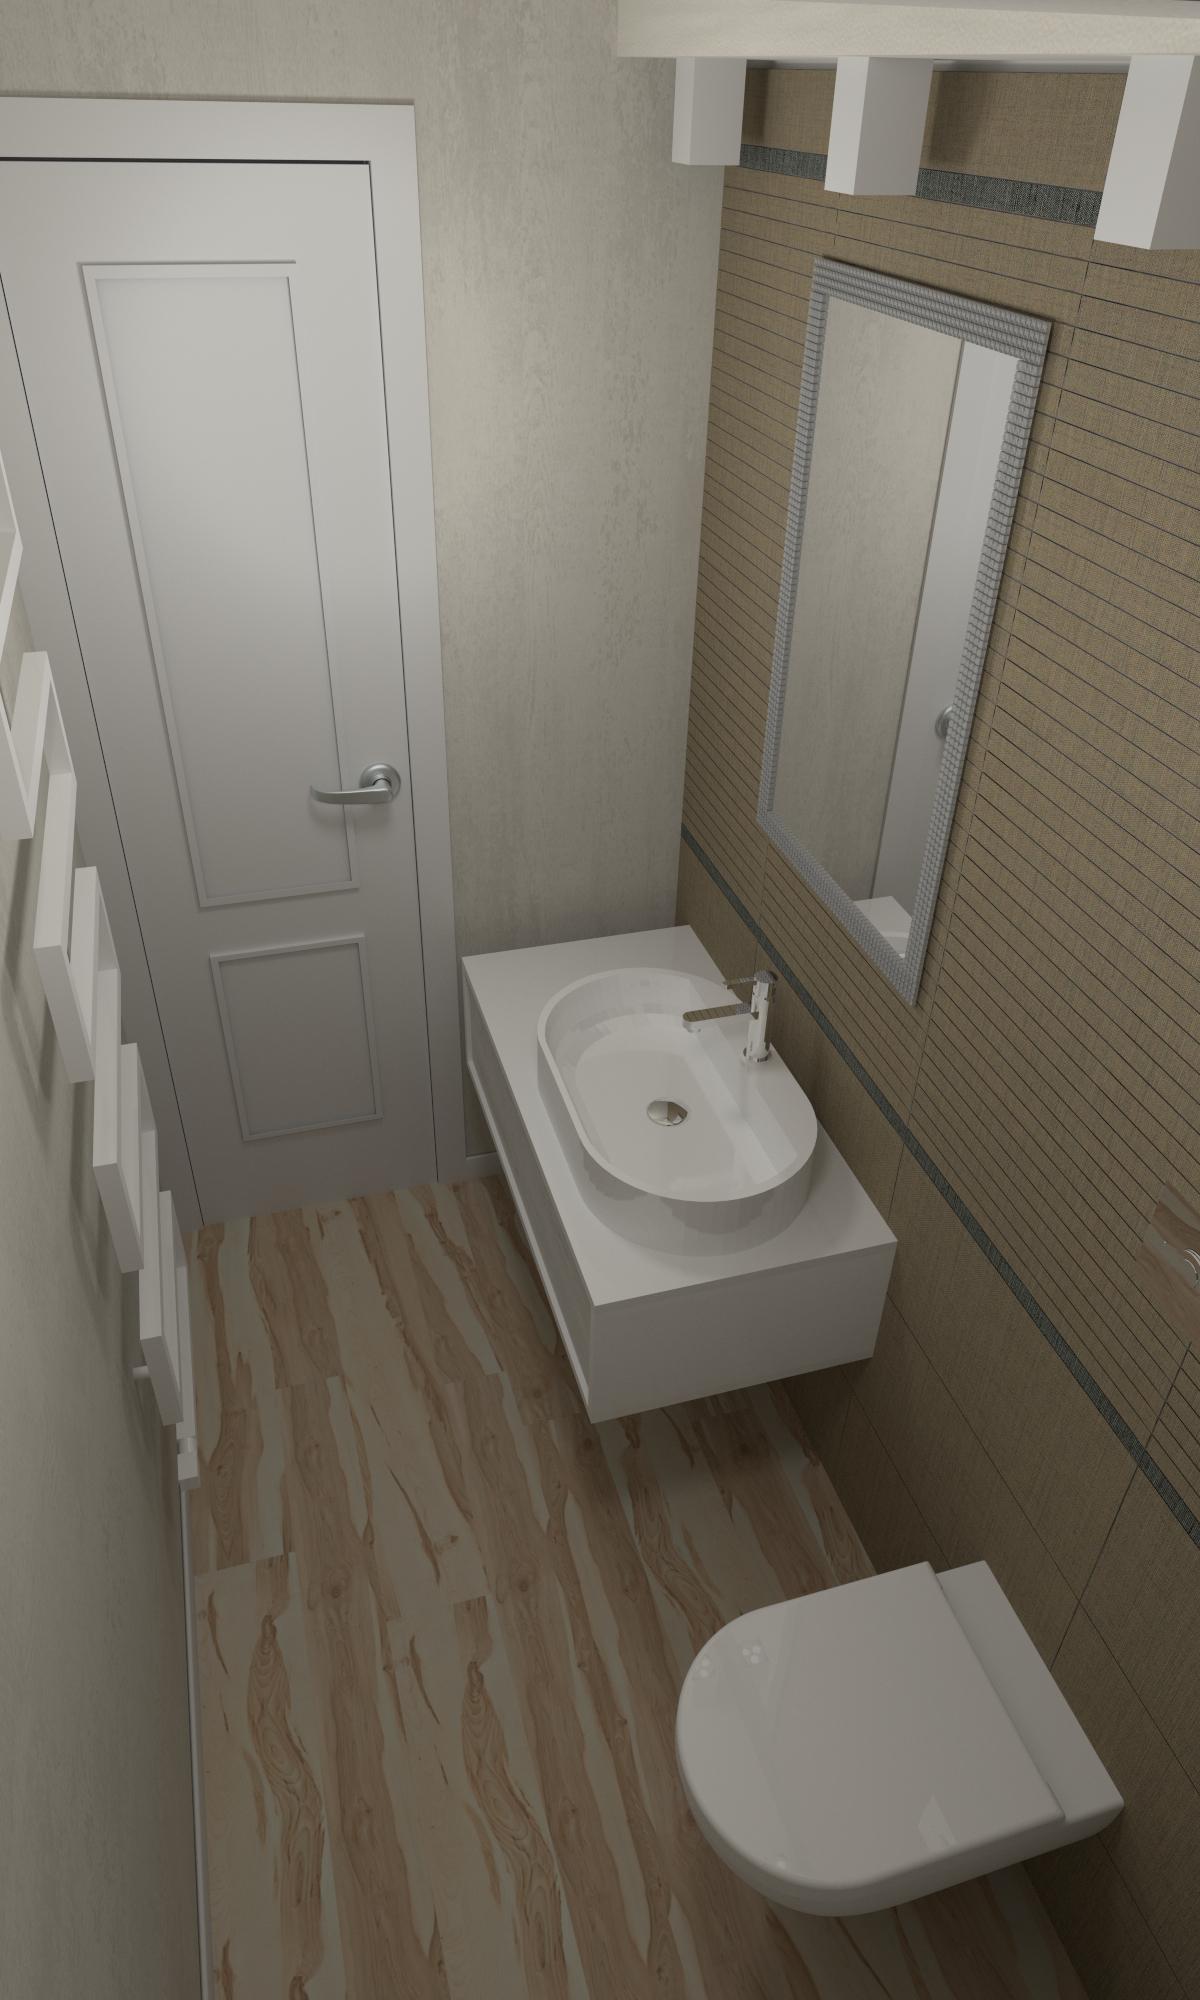 Progettare bagno 3d stunning accessori bagno d portasaponi d dwg with progettare bagno 3d d di - Progetto bagno 3d gratis ...